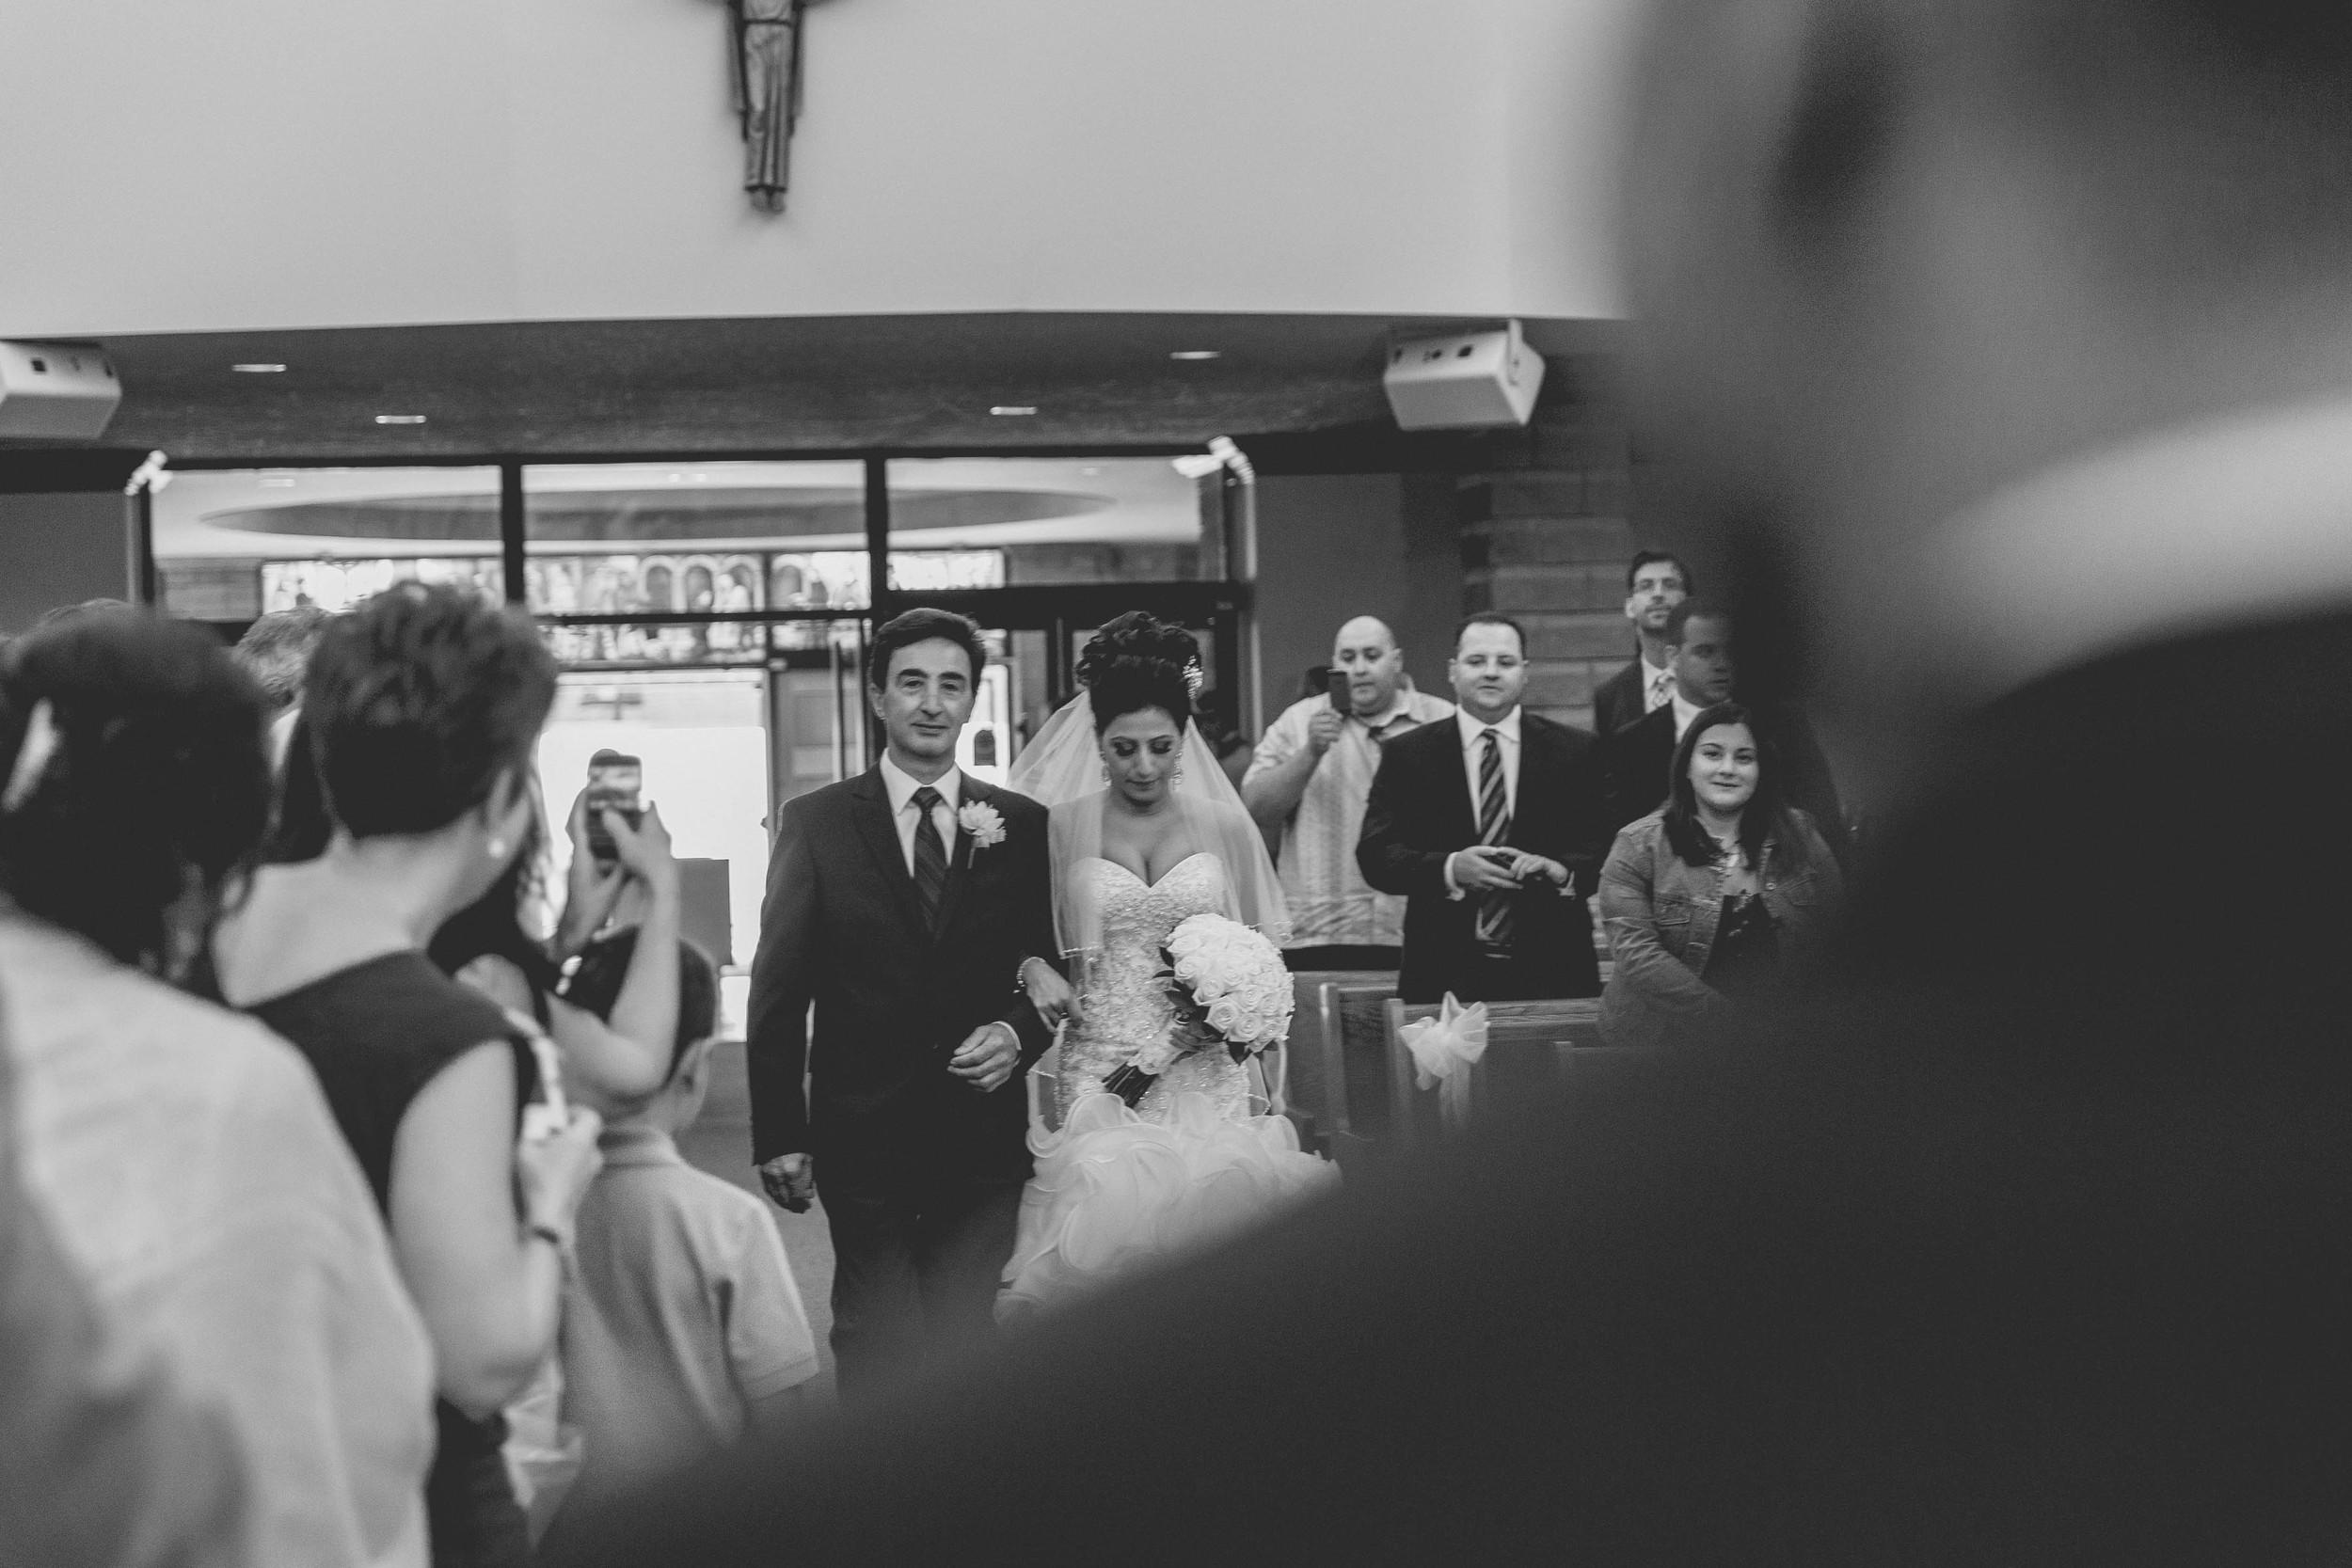 Toronto Wedding Photography | Caterina & Elvis, Pickering catholic wedding (34 of 39).jpg